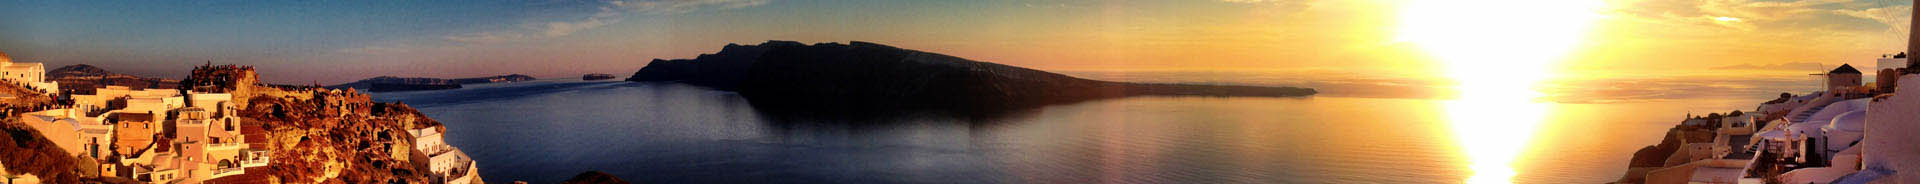 Oia, Santorini: Elegance & Tranquility All Year Round